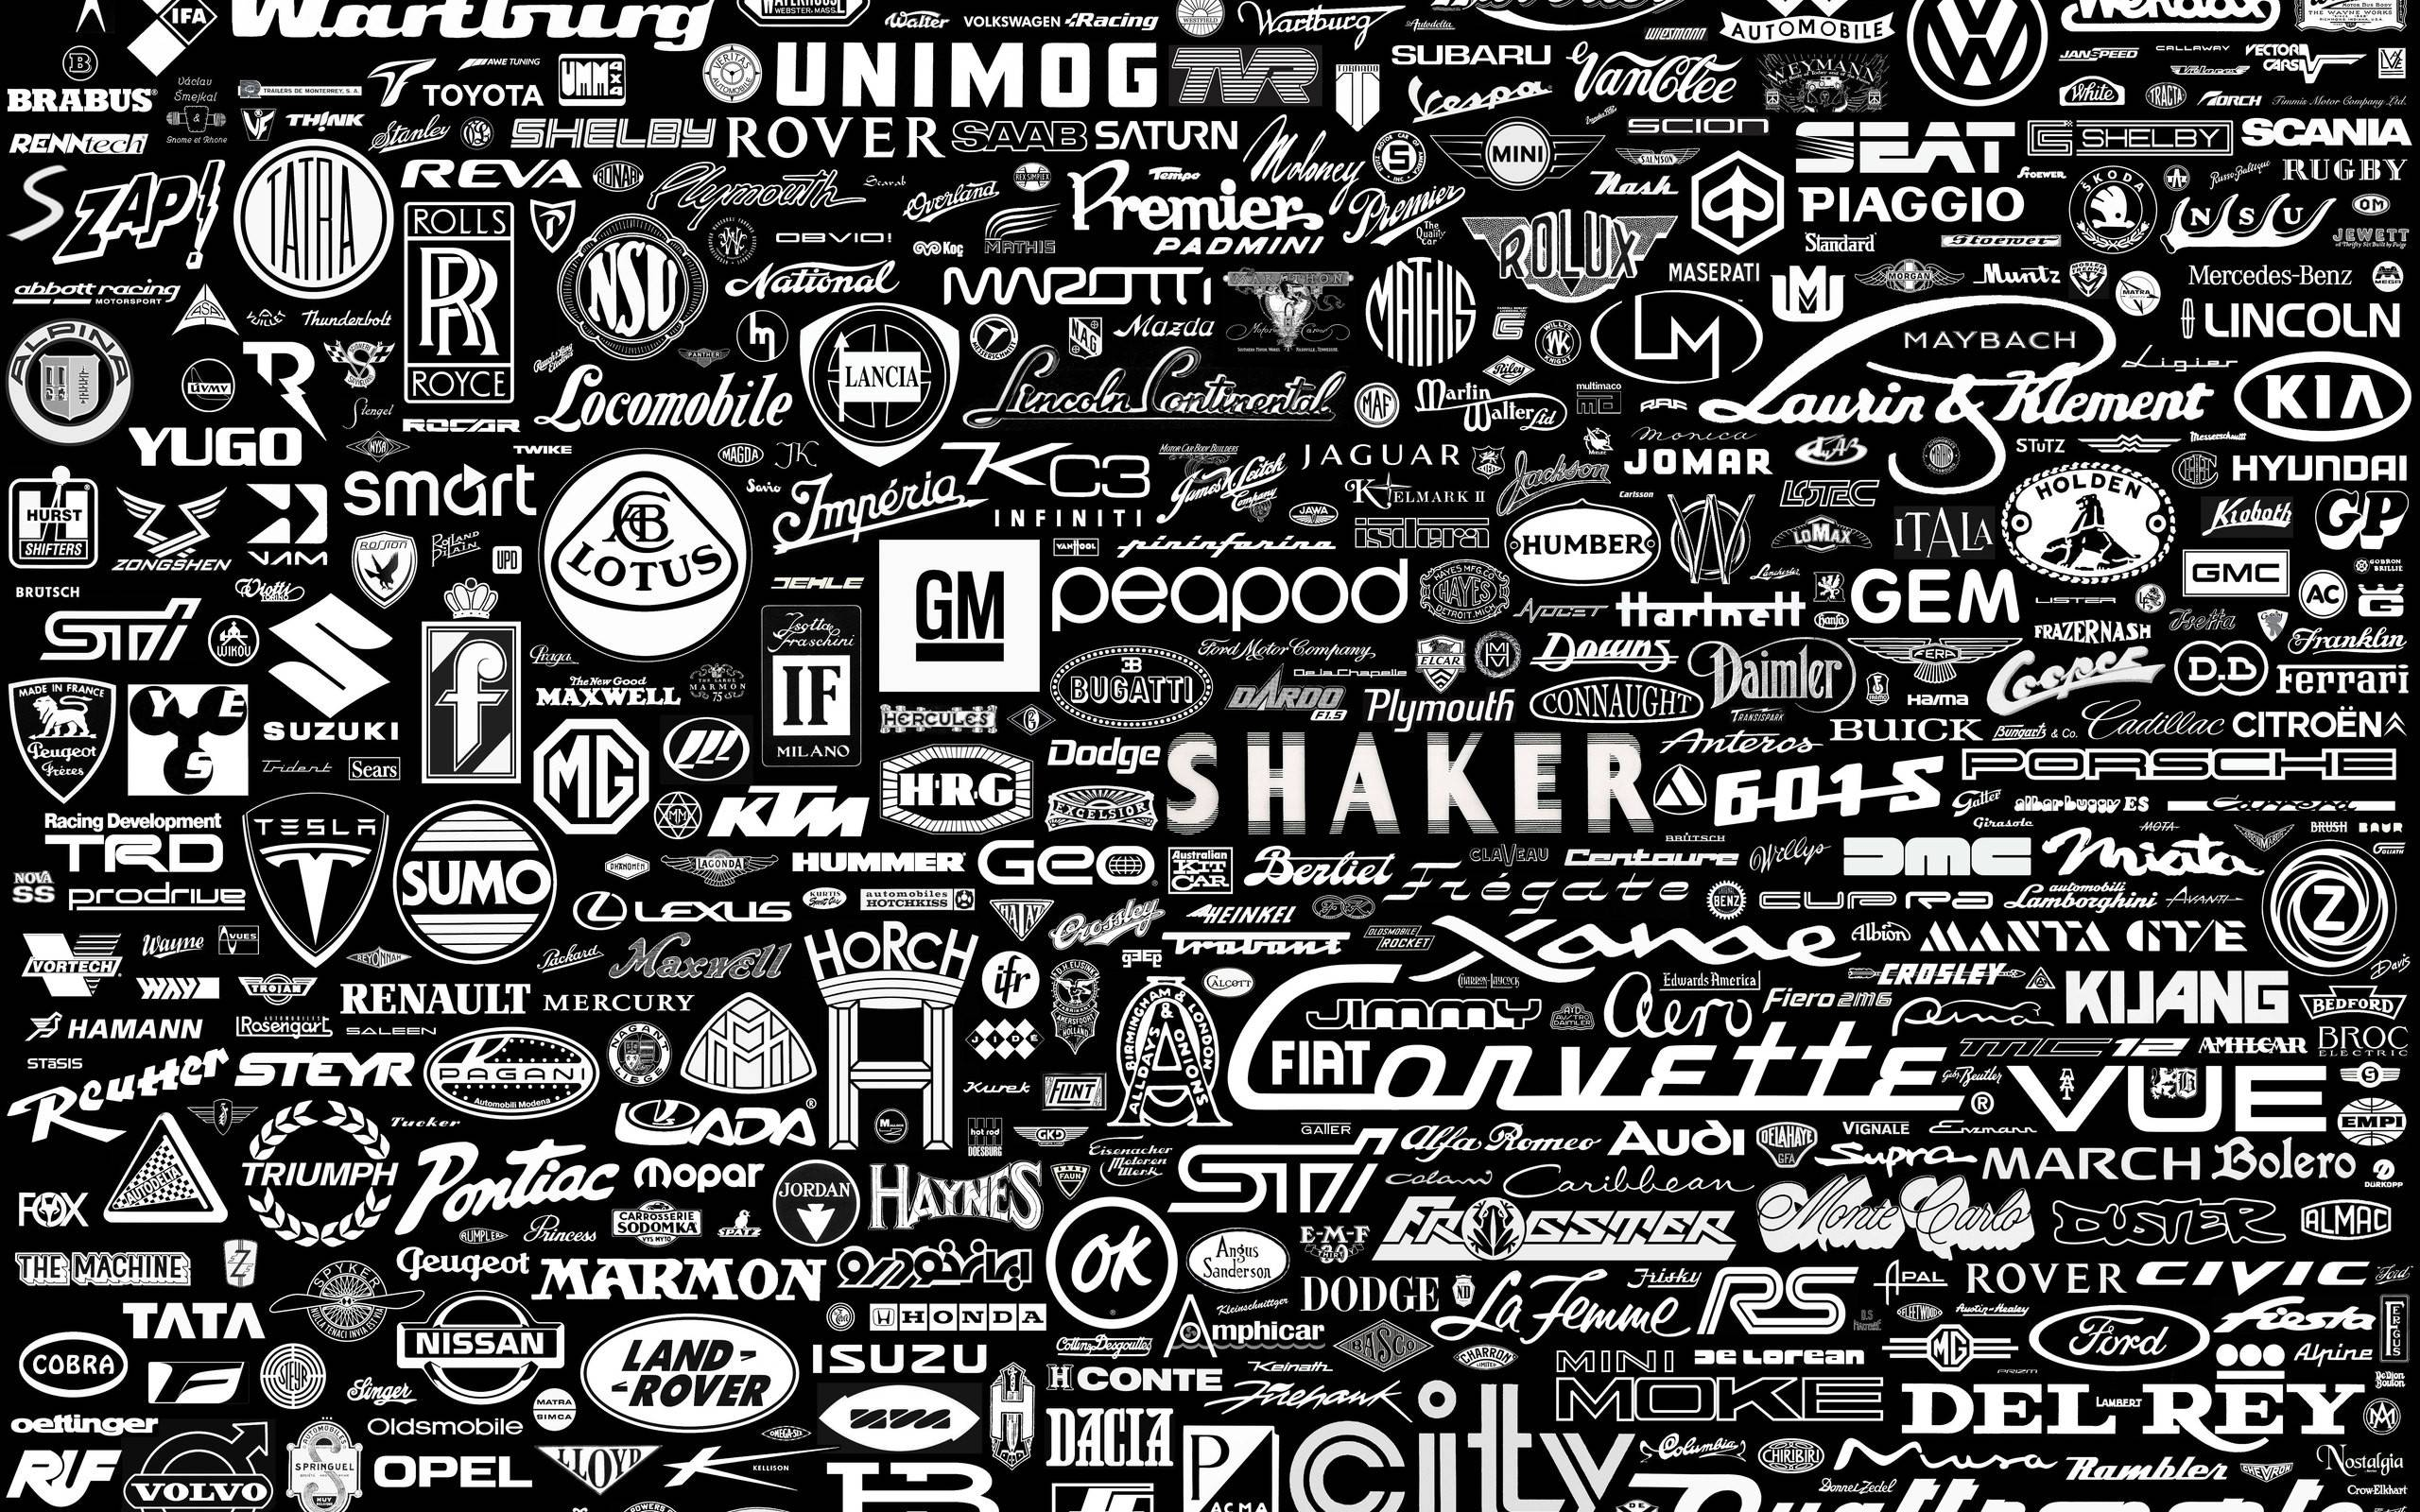 Alternative Bands Collage